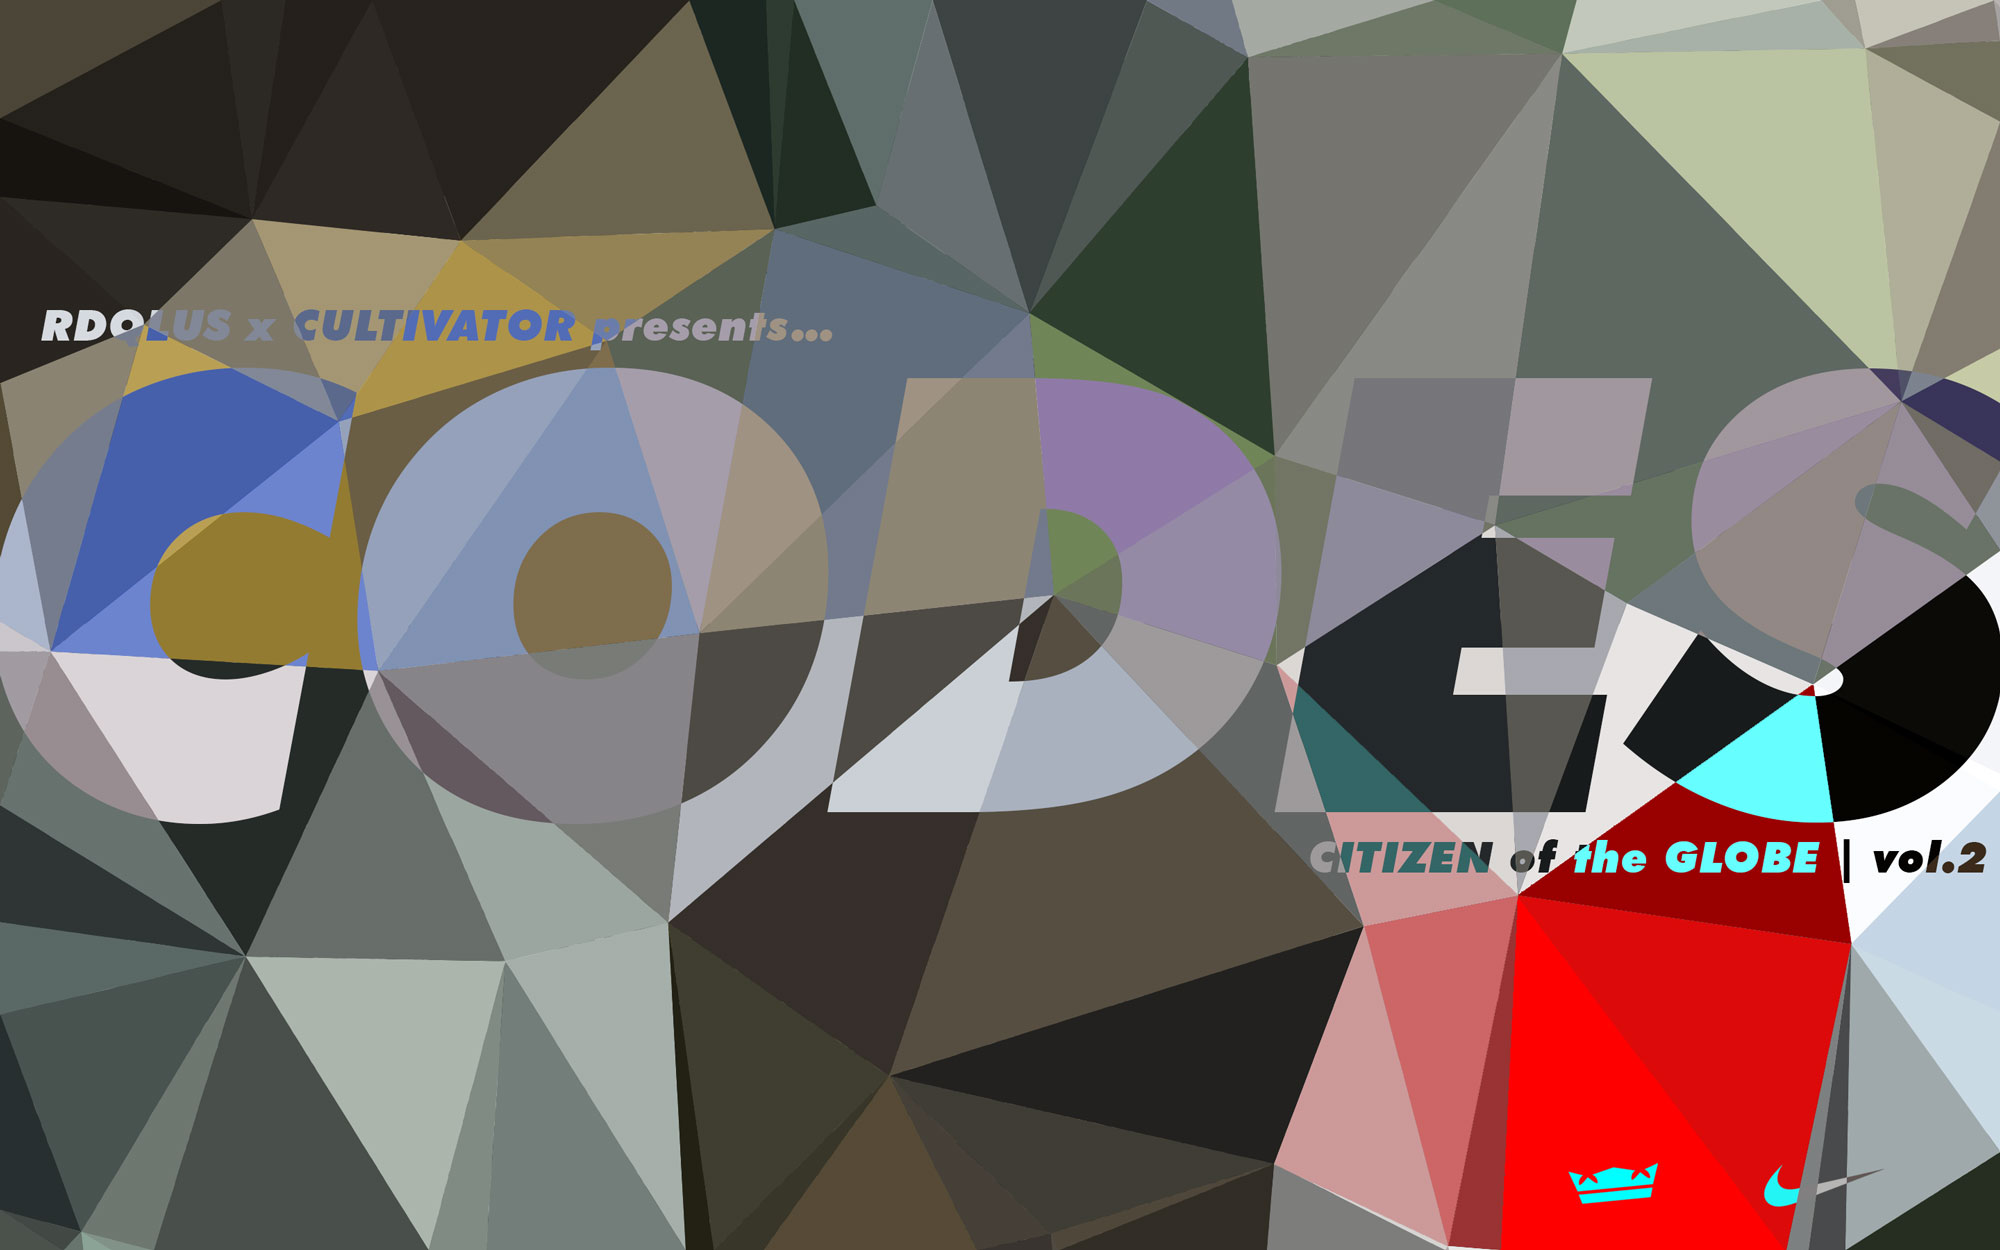 RDQLUS.Cultivator.main.poster-website.jpg